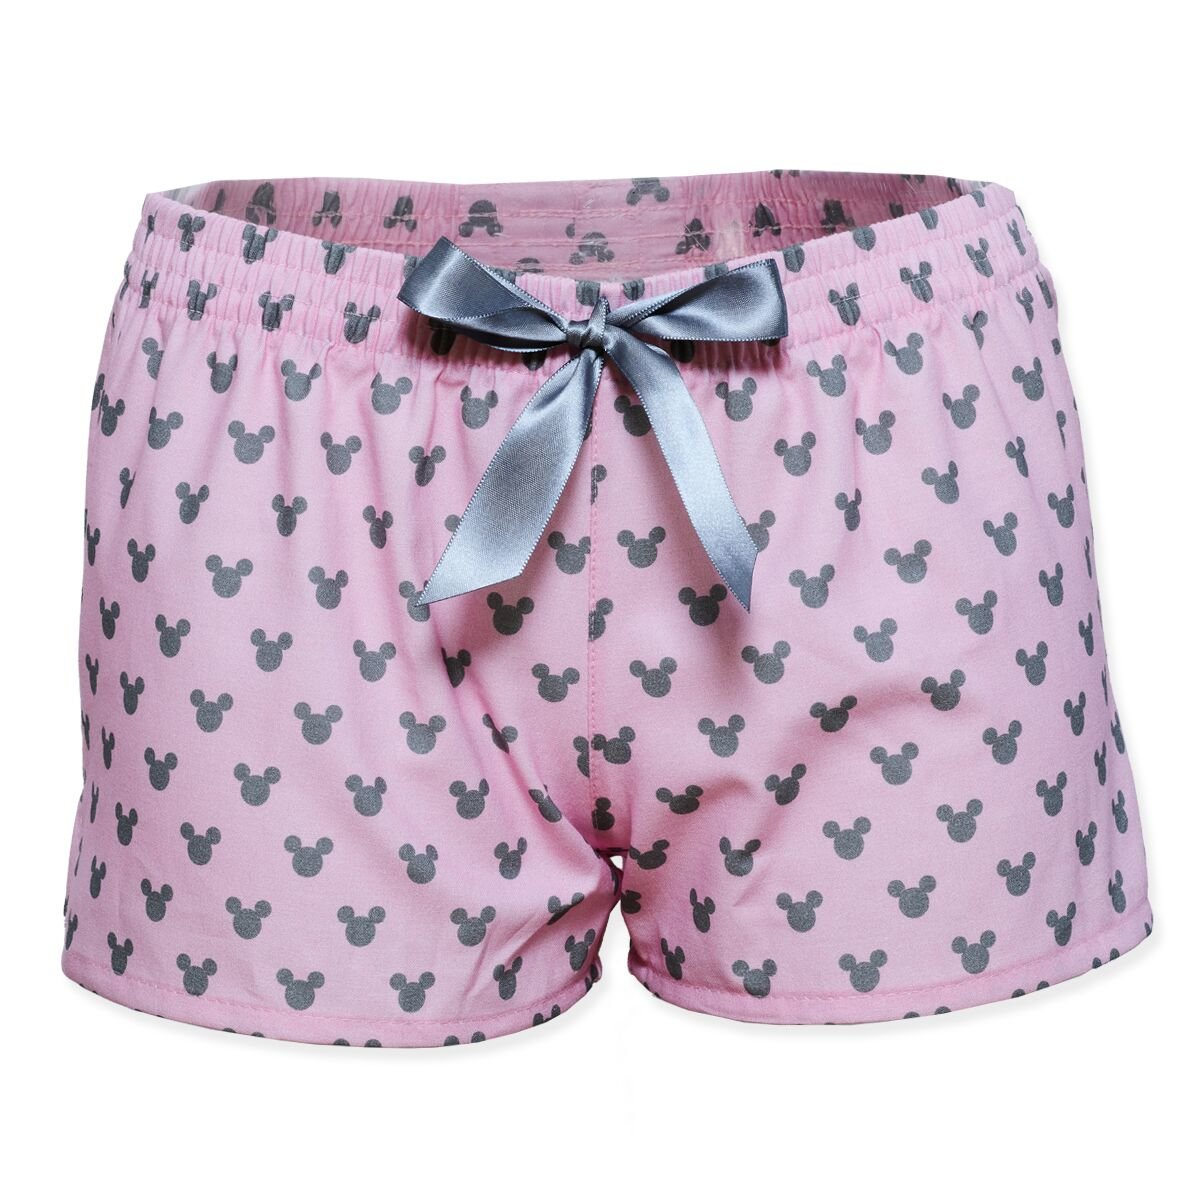 Slippsy růžové dámské trenýrky Minnie